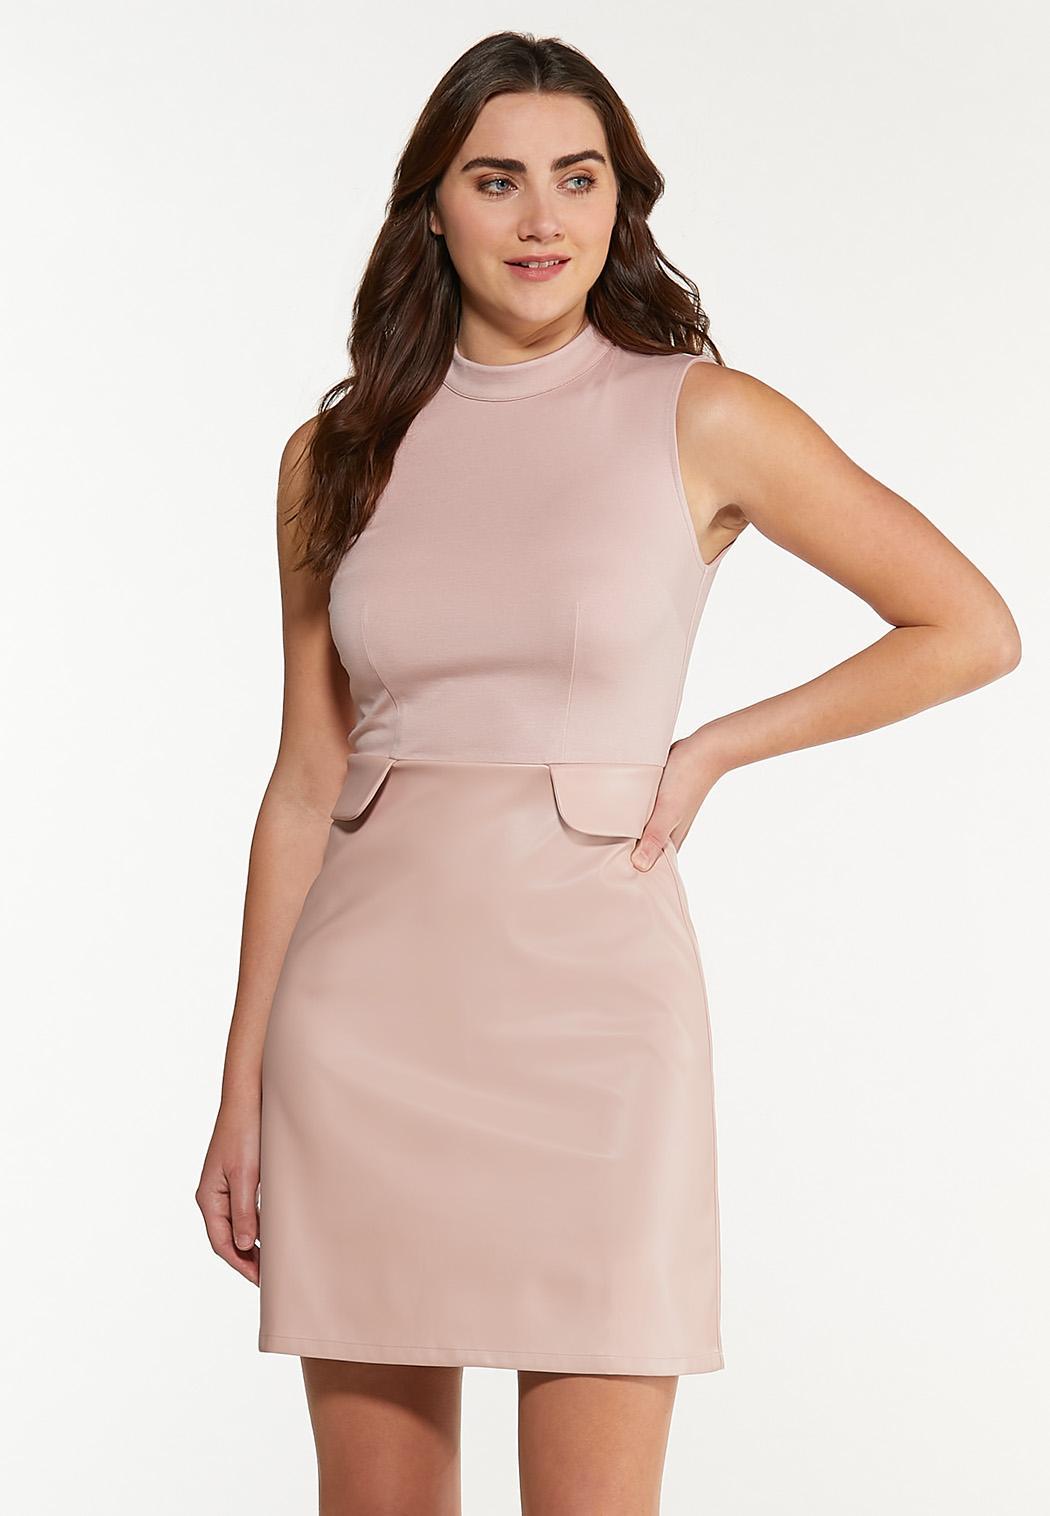 Blush Mock Neck Dress